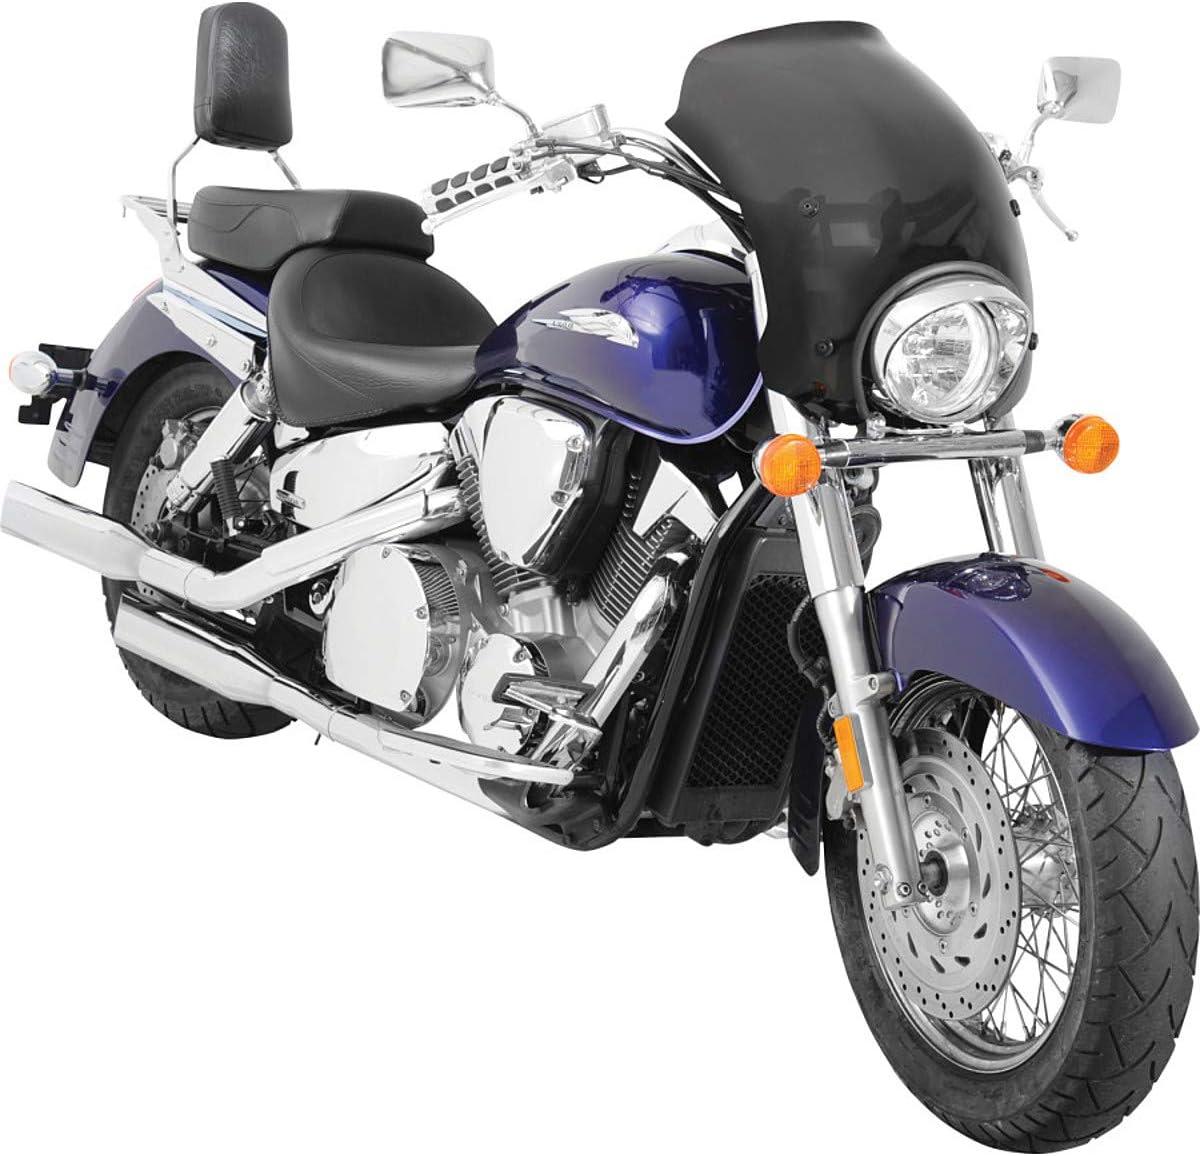 Memphis Shades MEM7071 Max 66% OFF Bullet Fairing Honda for Directly managed store Stateli VT1300CR